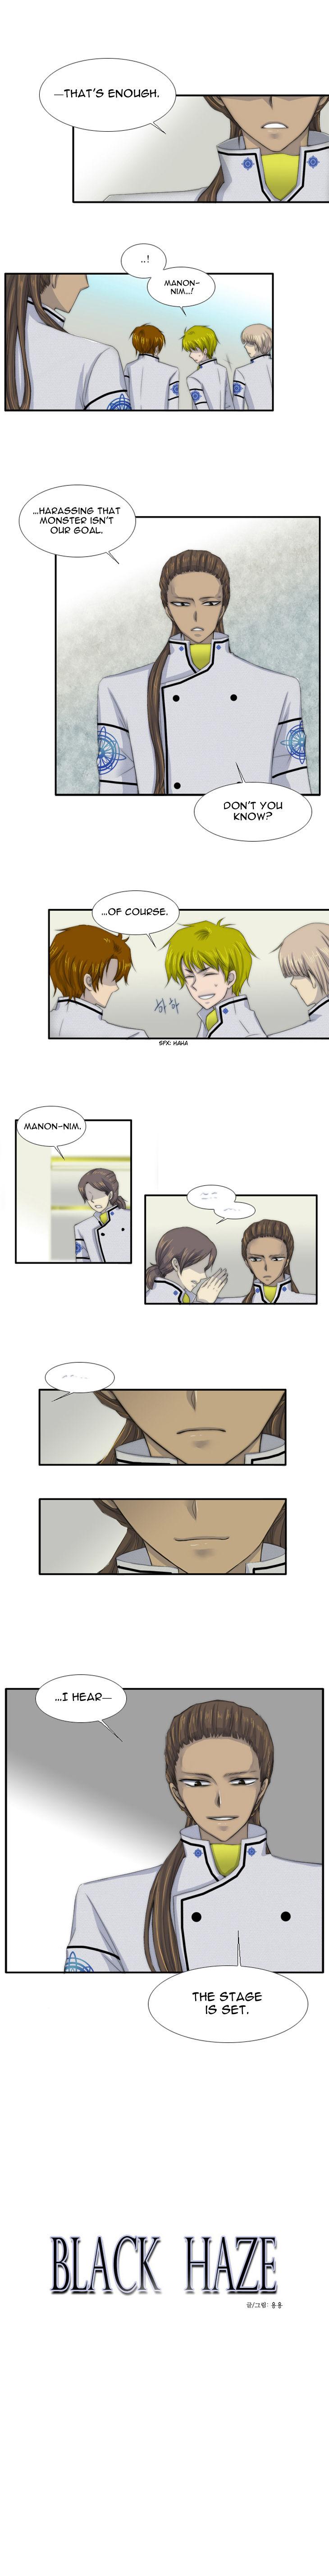 Black Haze 22 Page 2